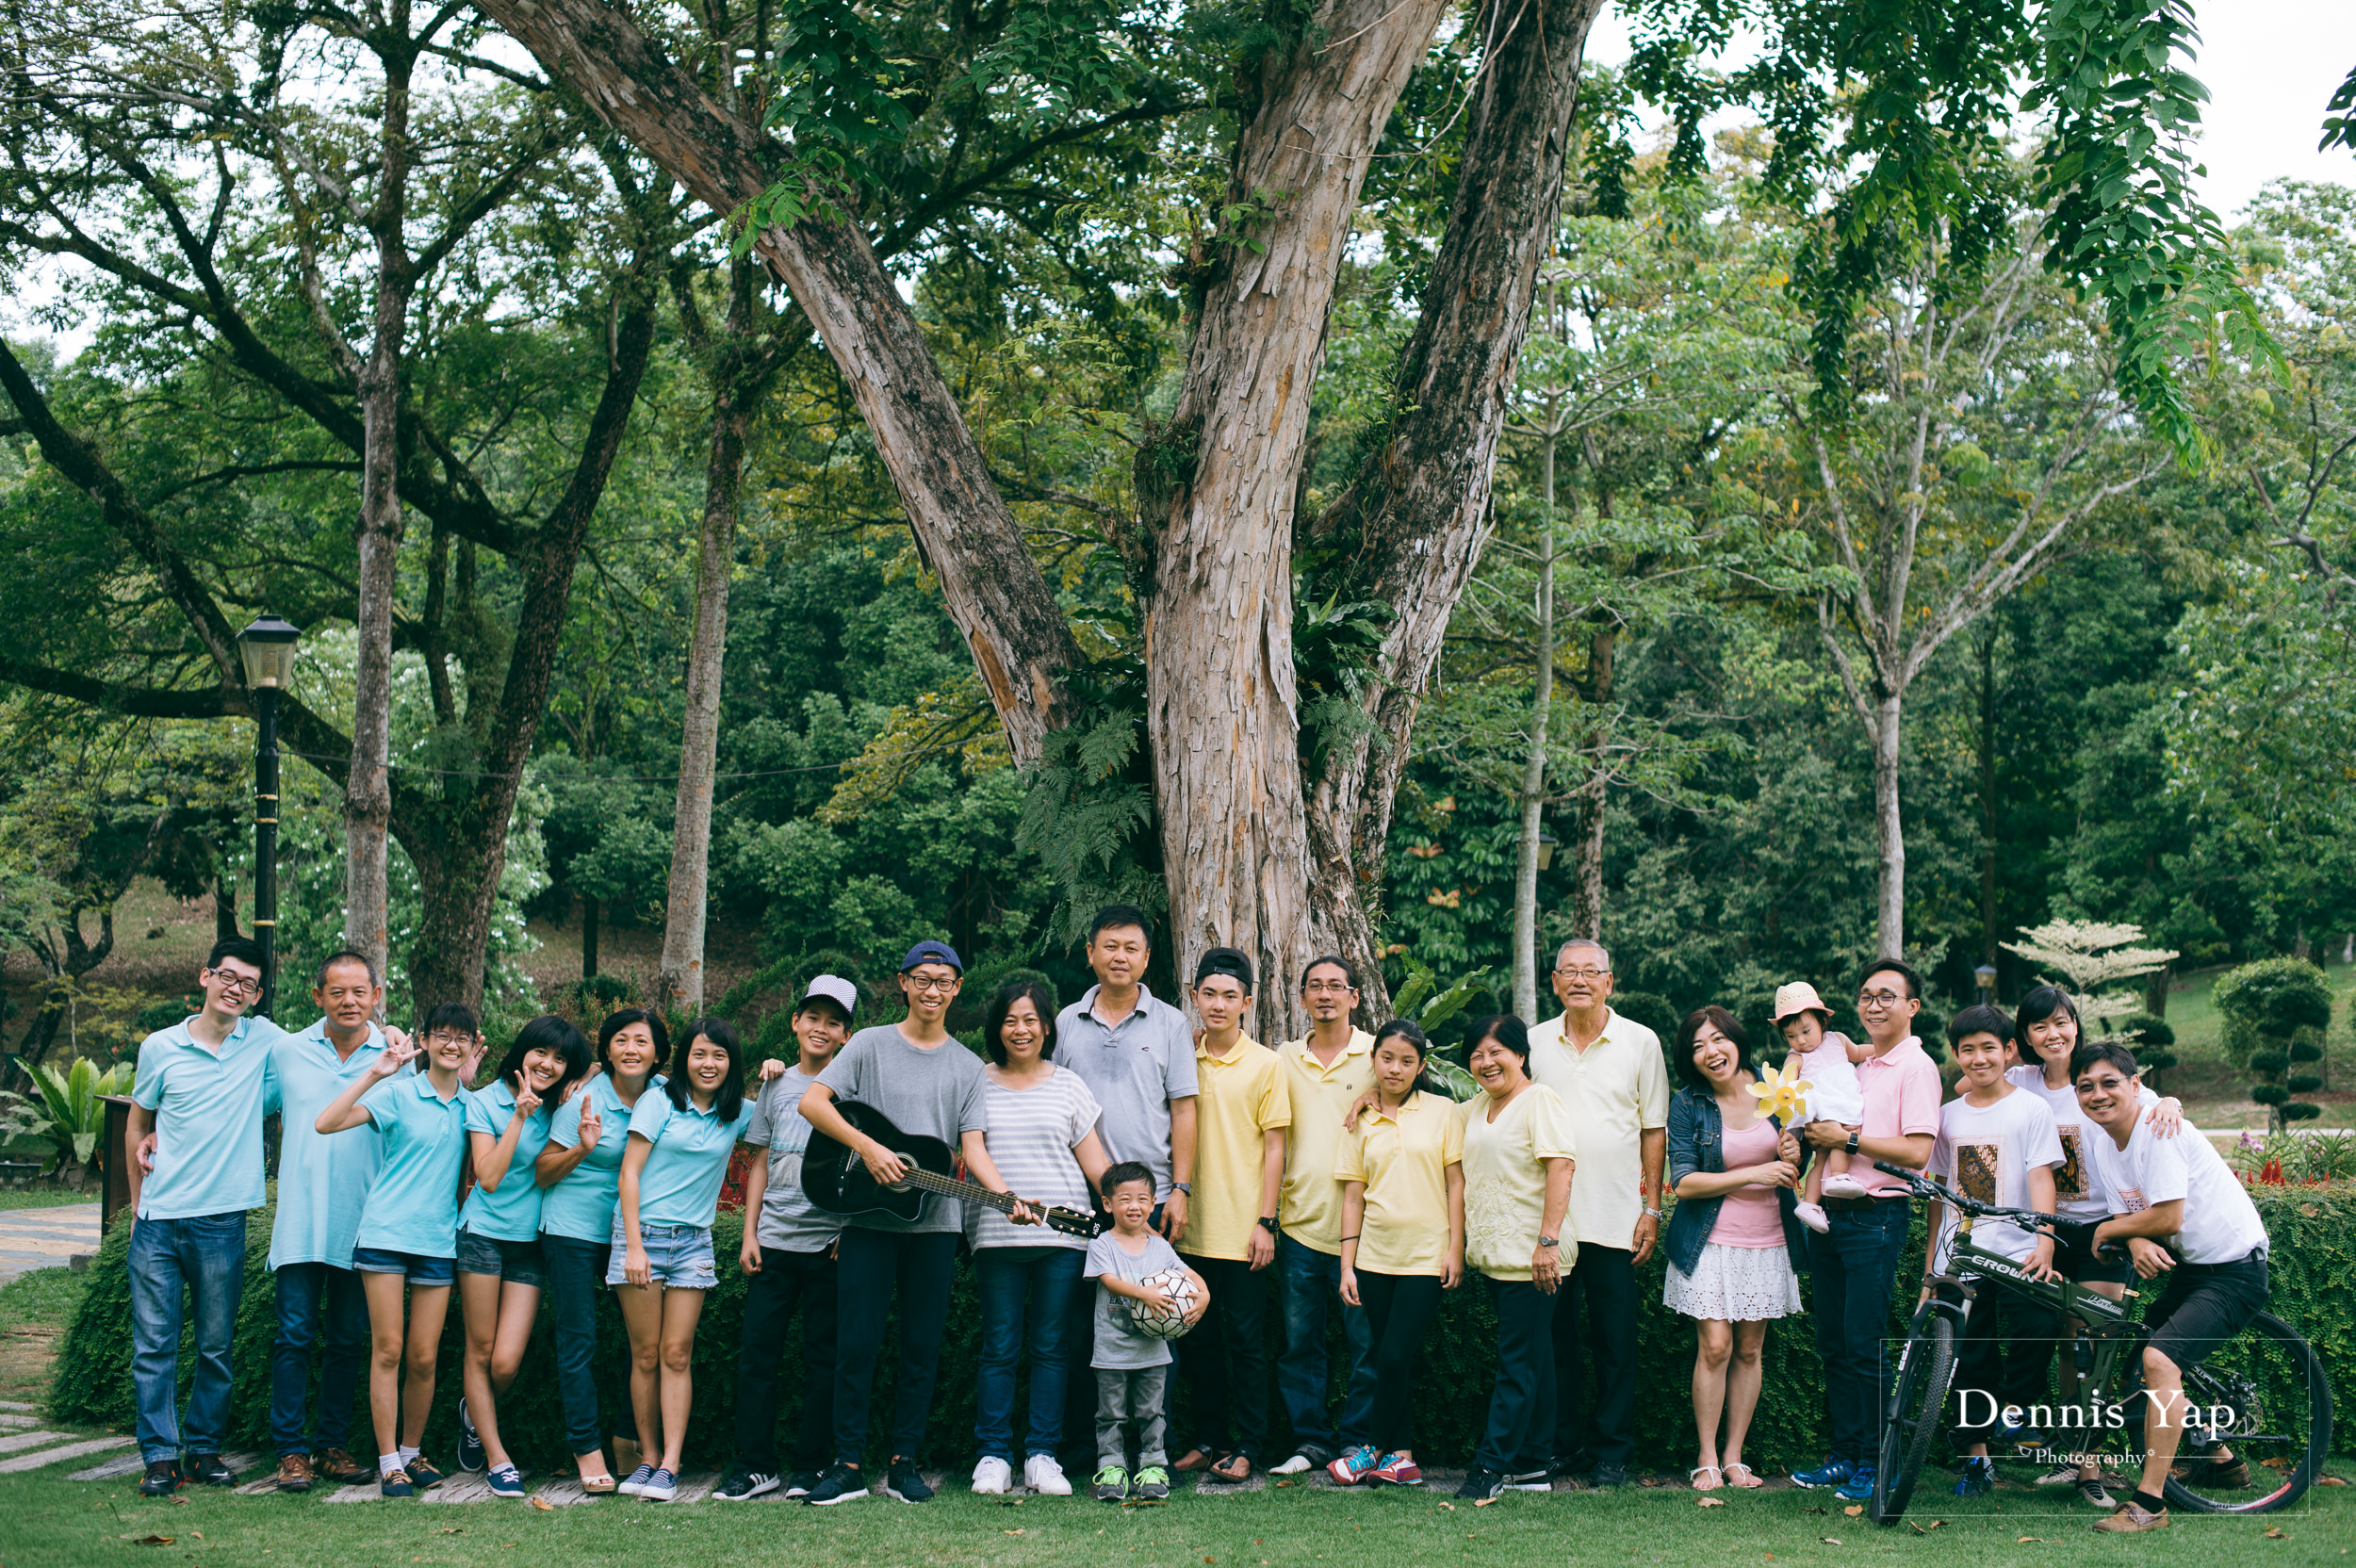 grace ang family portrait lake gardens dennis yap photography-31.jpg